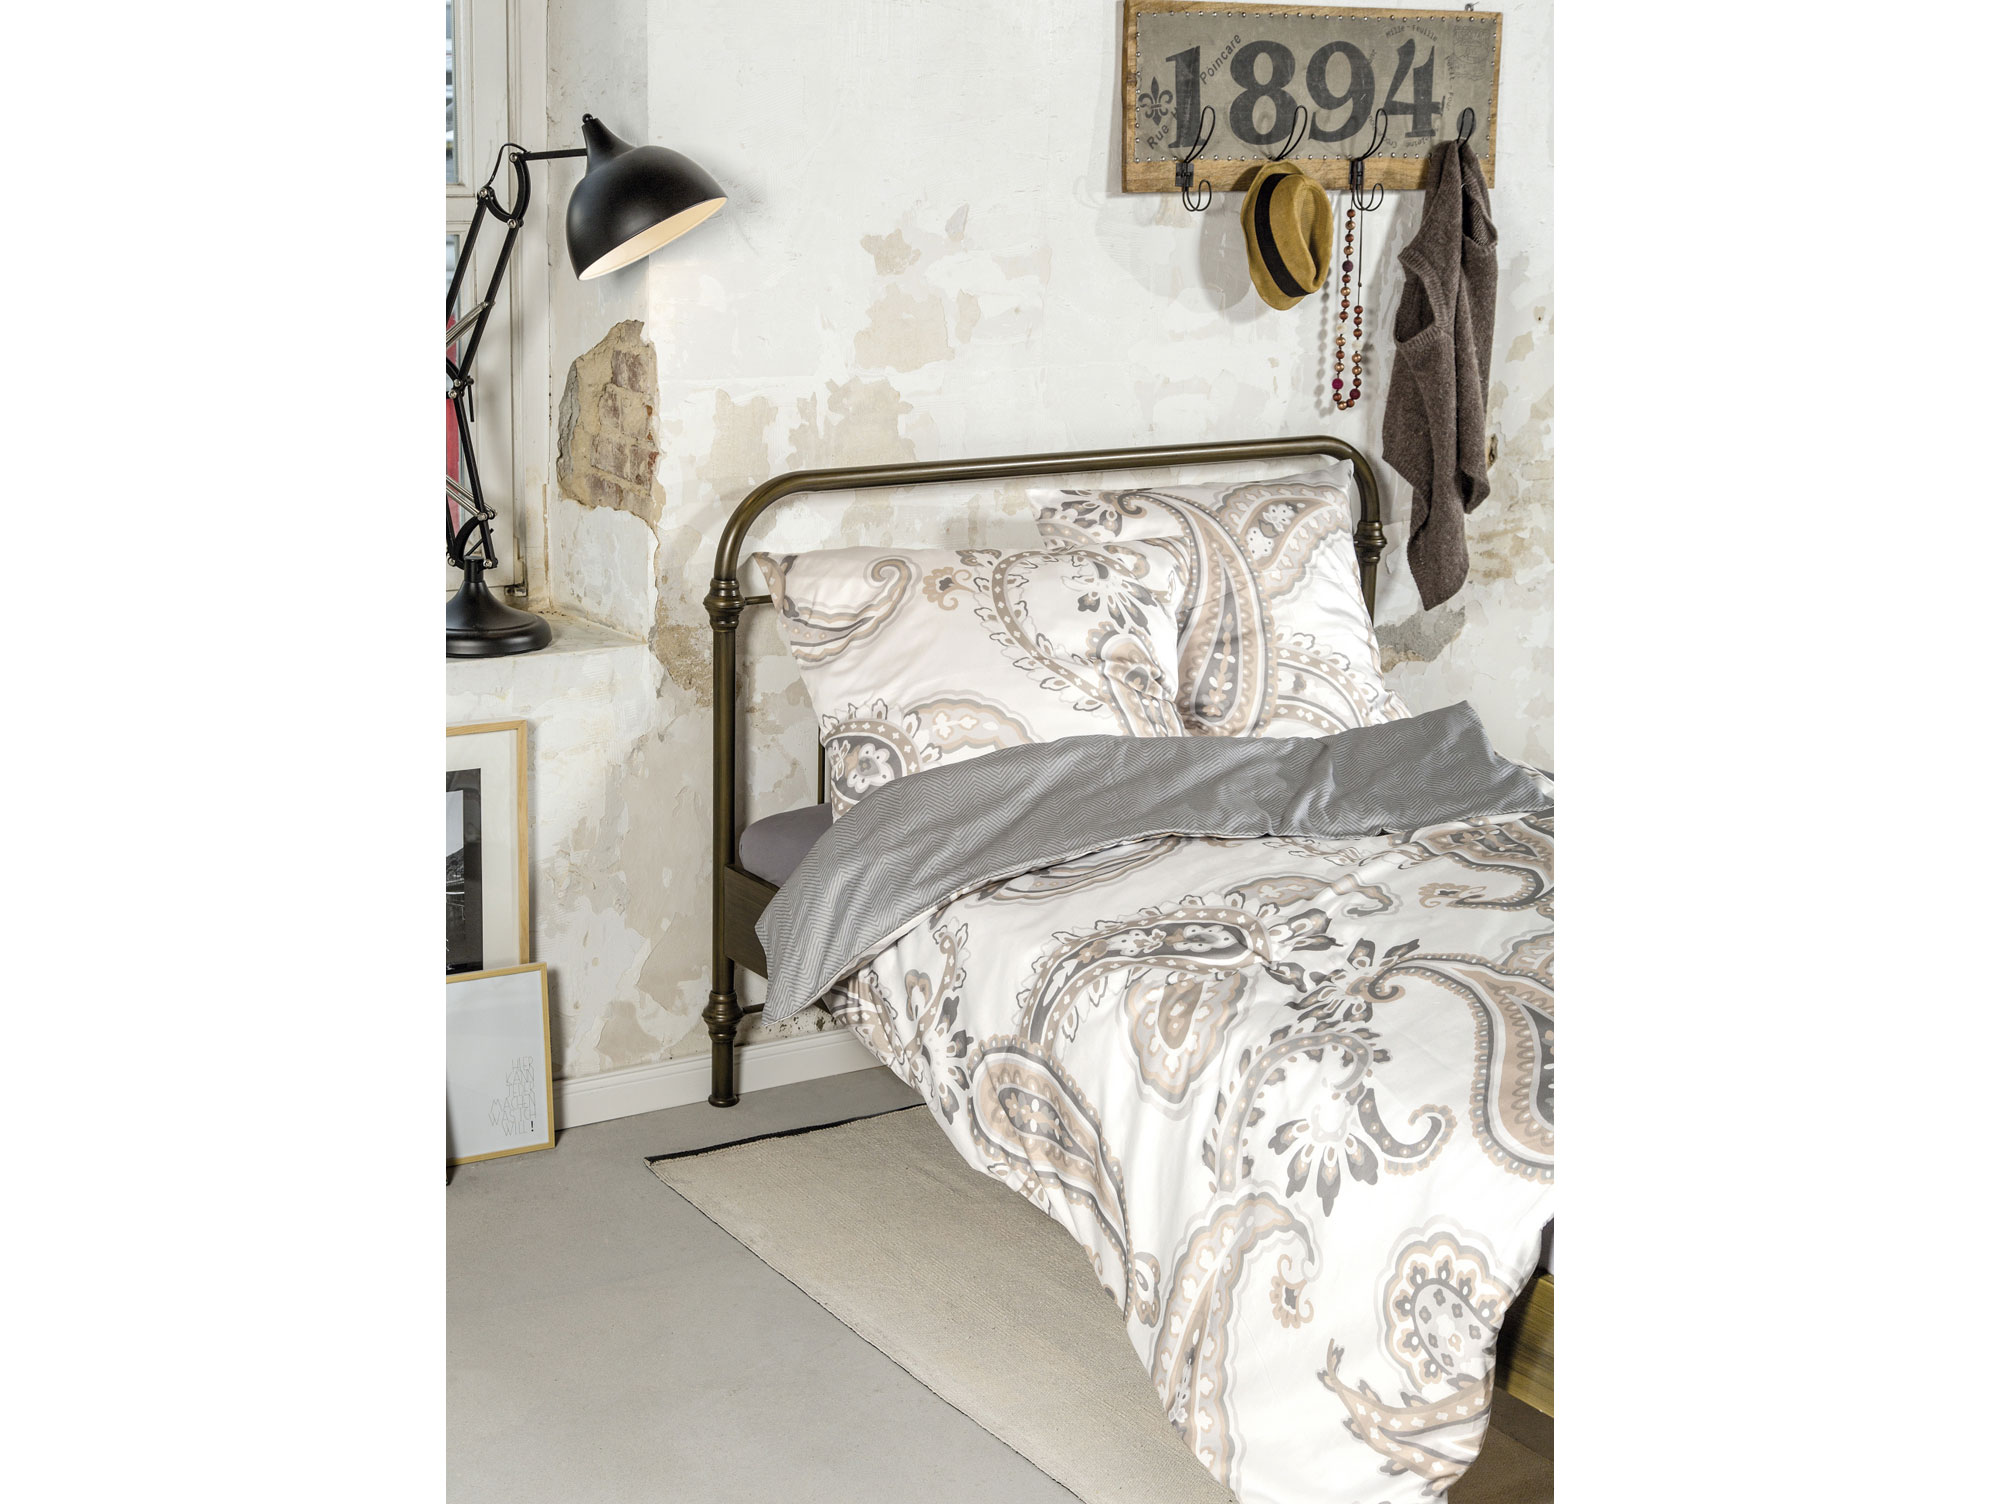 zeitgeist bettw sche feinflanell 135x200 80x80 cm. Black Bedroom Furniture Sets. Home Design Ideas